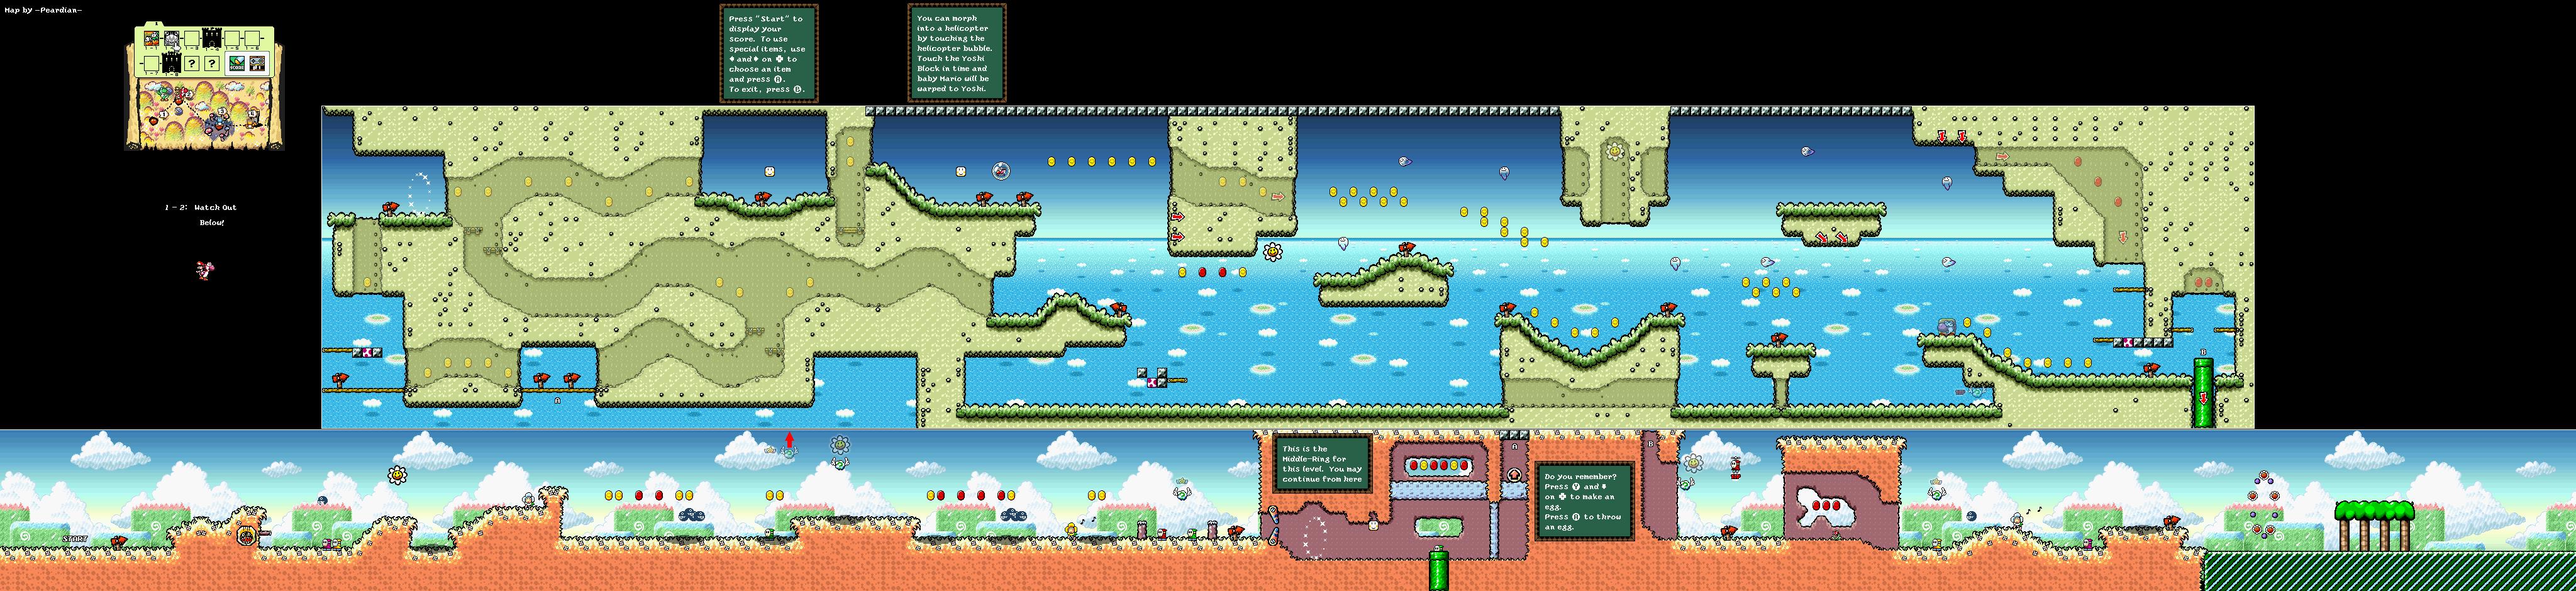 Super mario world 2 yoshis island game maps yoshis island world1 2 watchoutbelow gumiabroncs Images